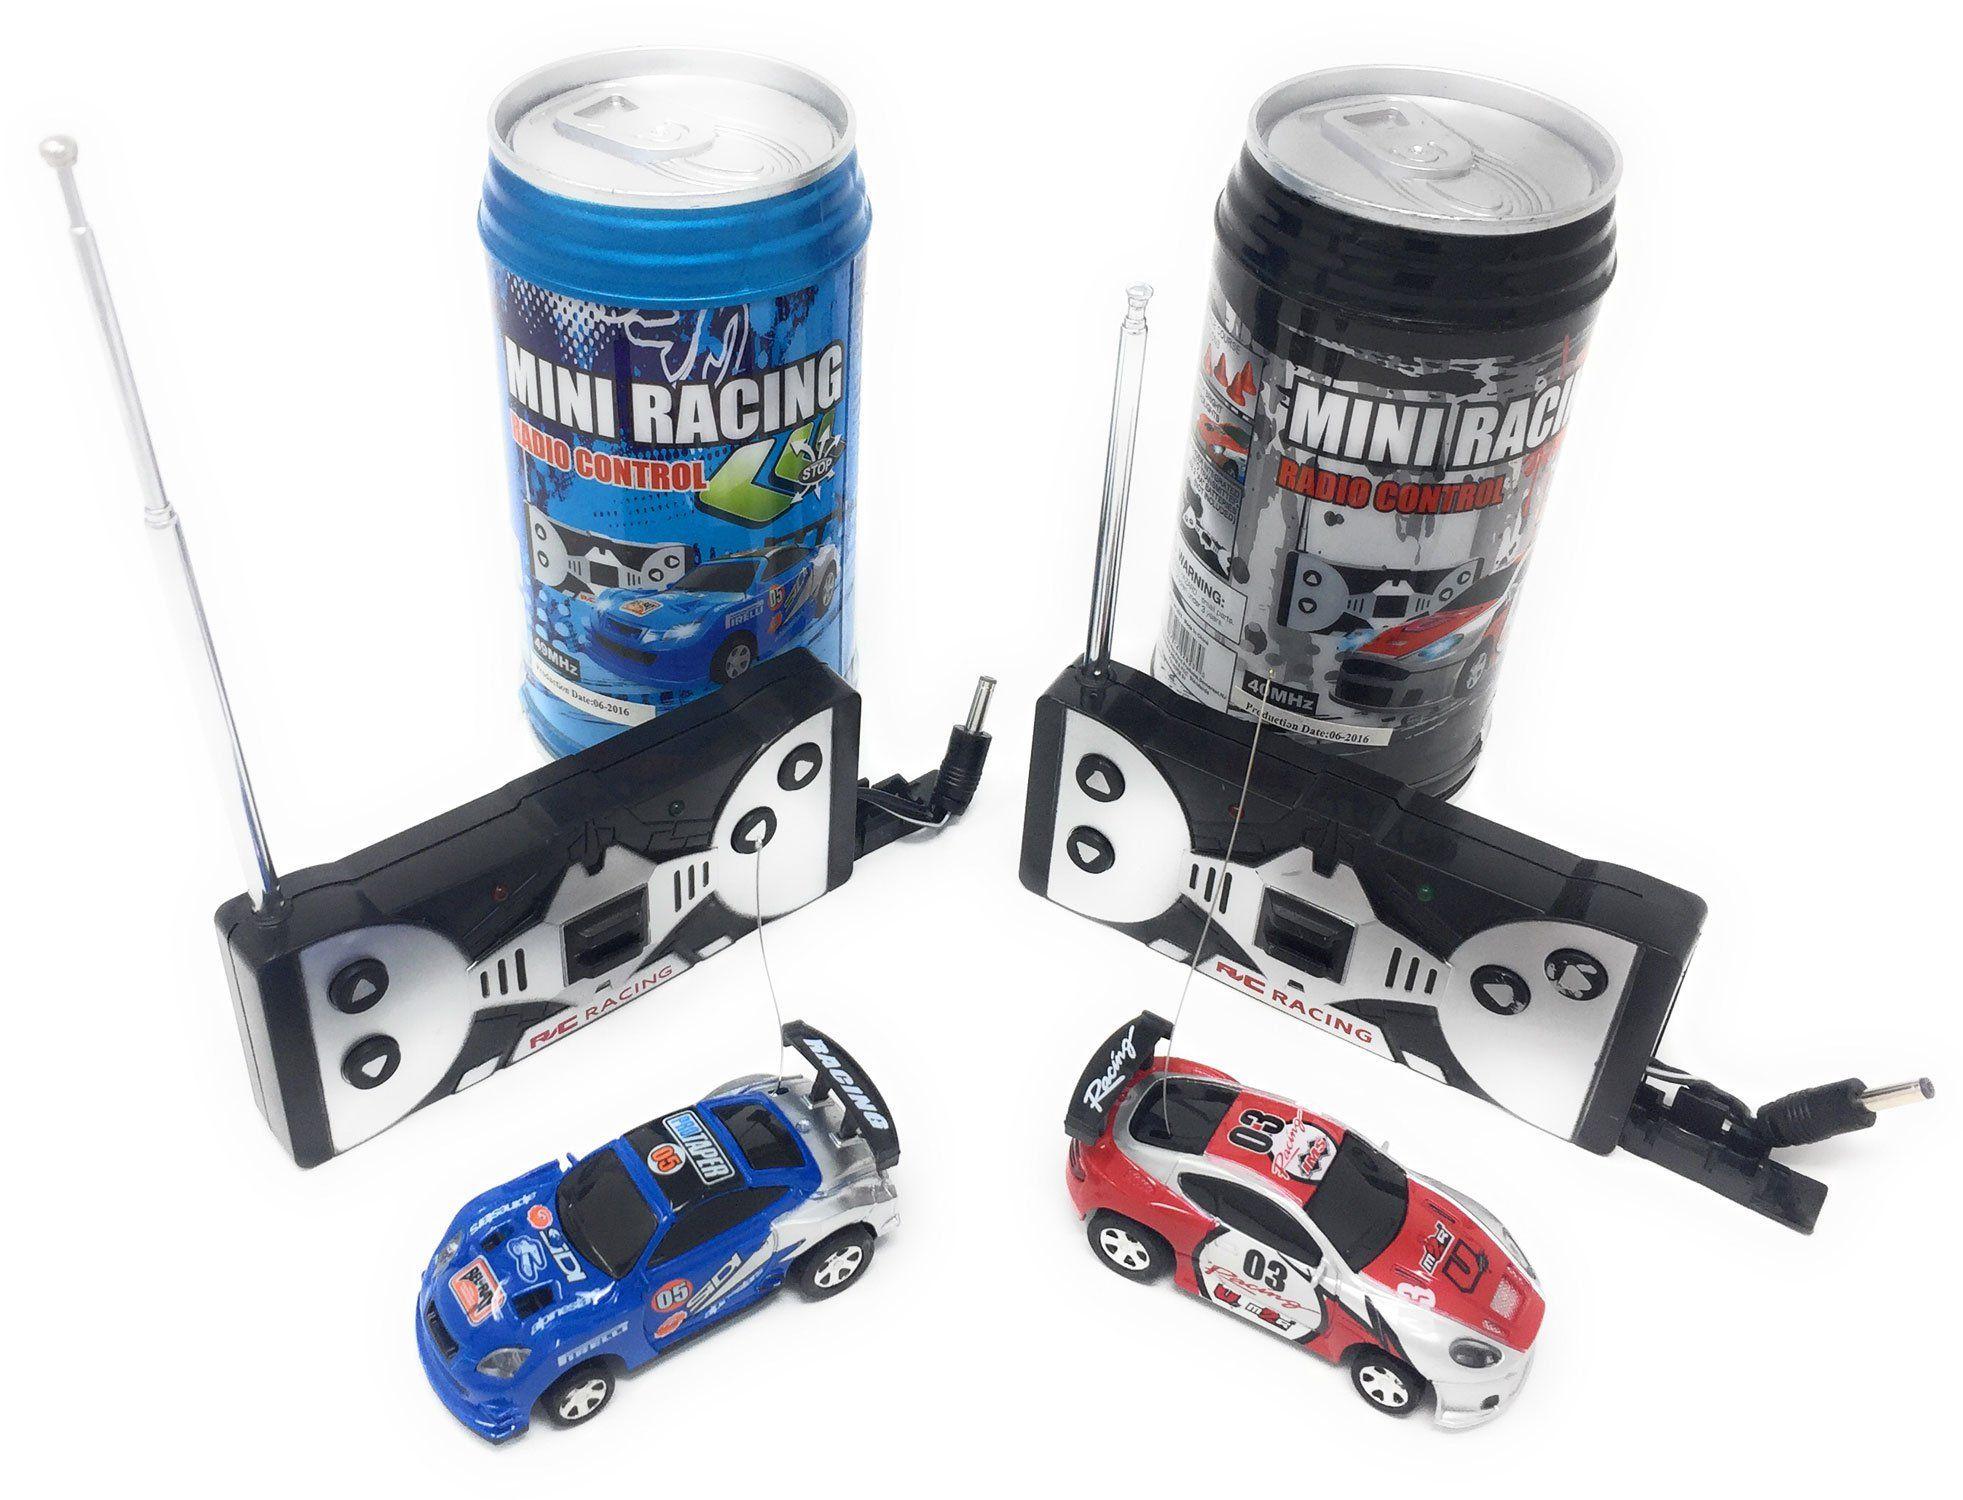 Mini RC Remote Control Car 2 Pcs Racing Game Set Smallest